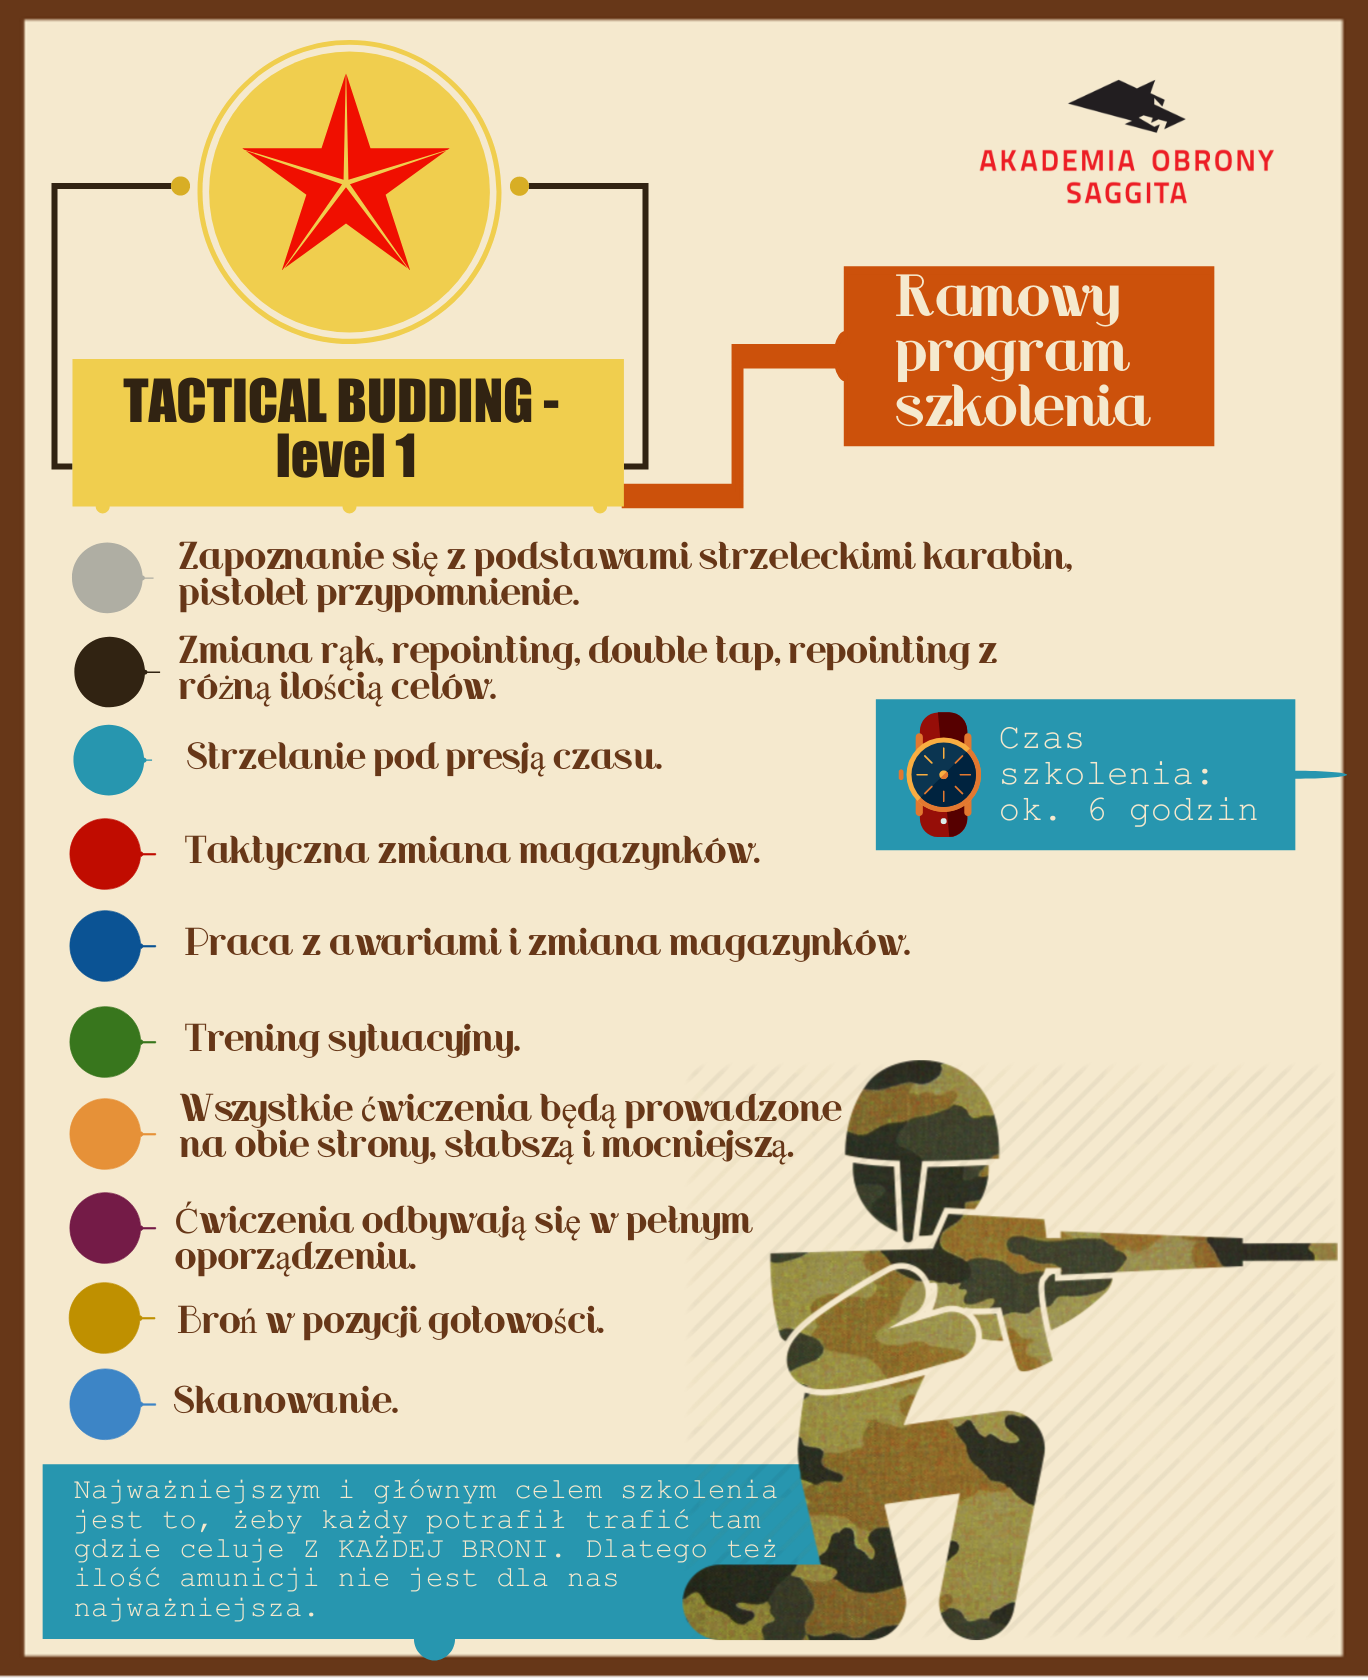 tactical budding program